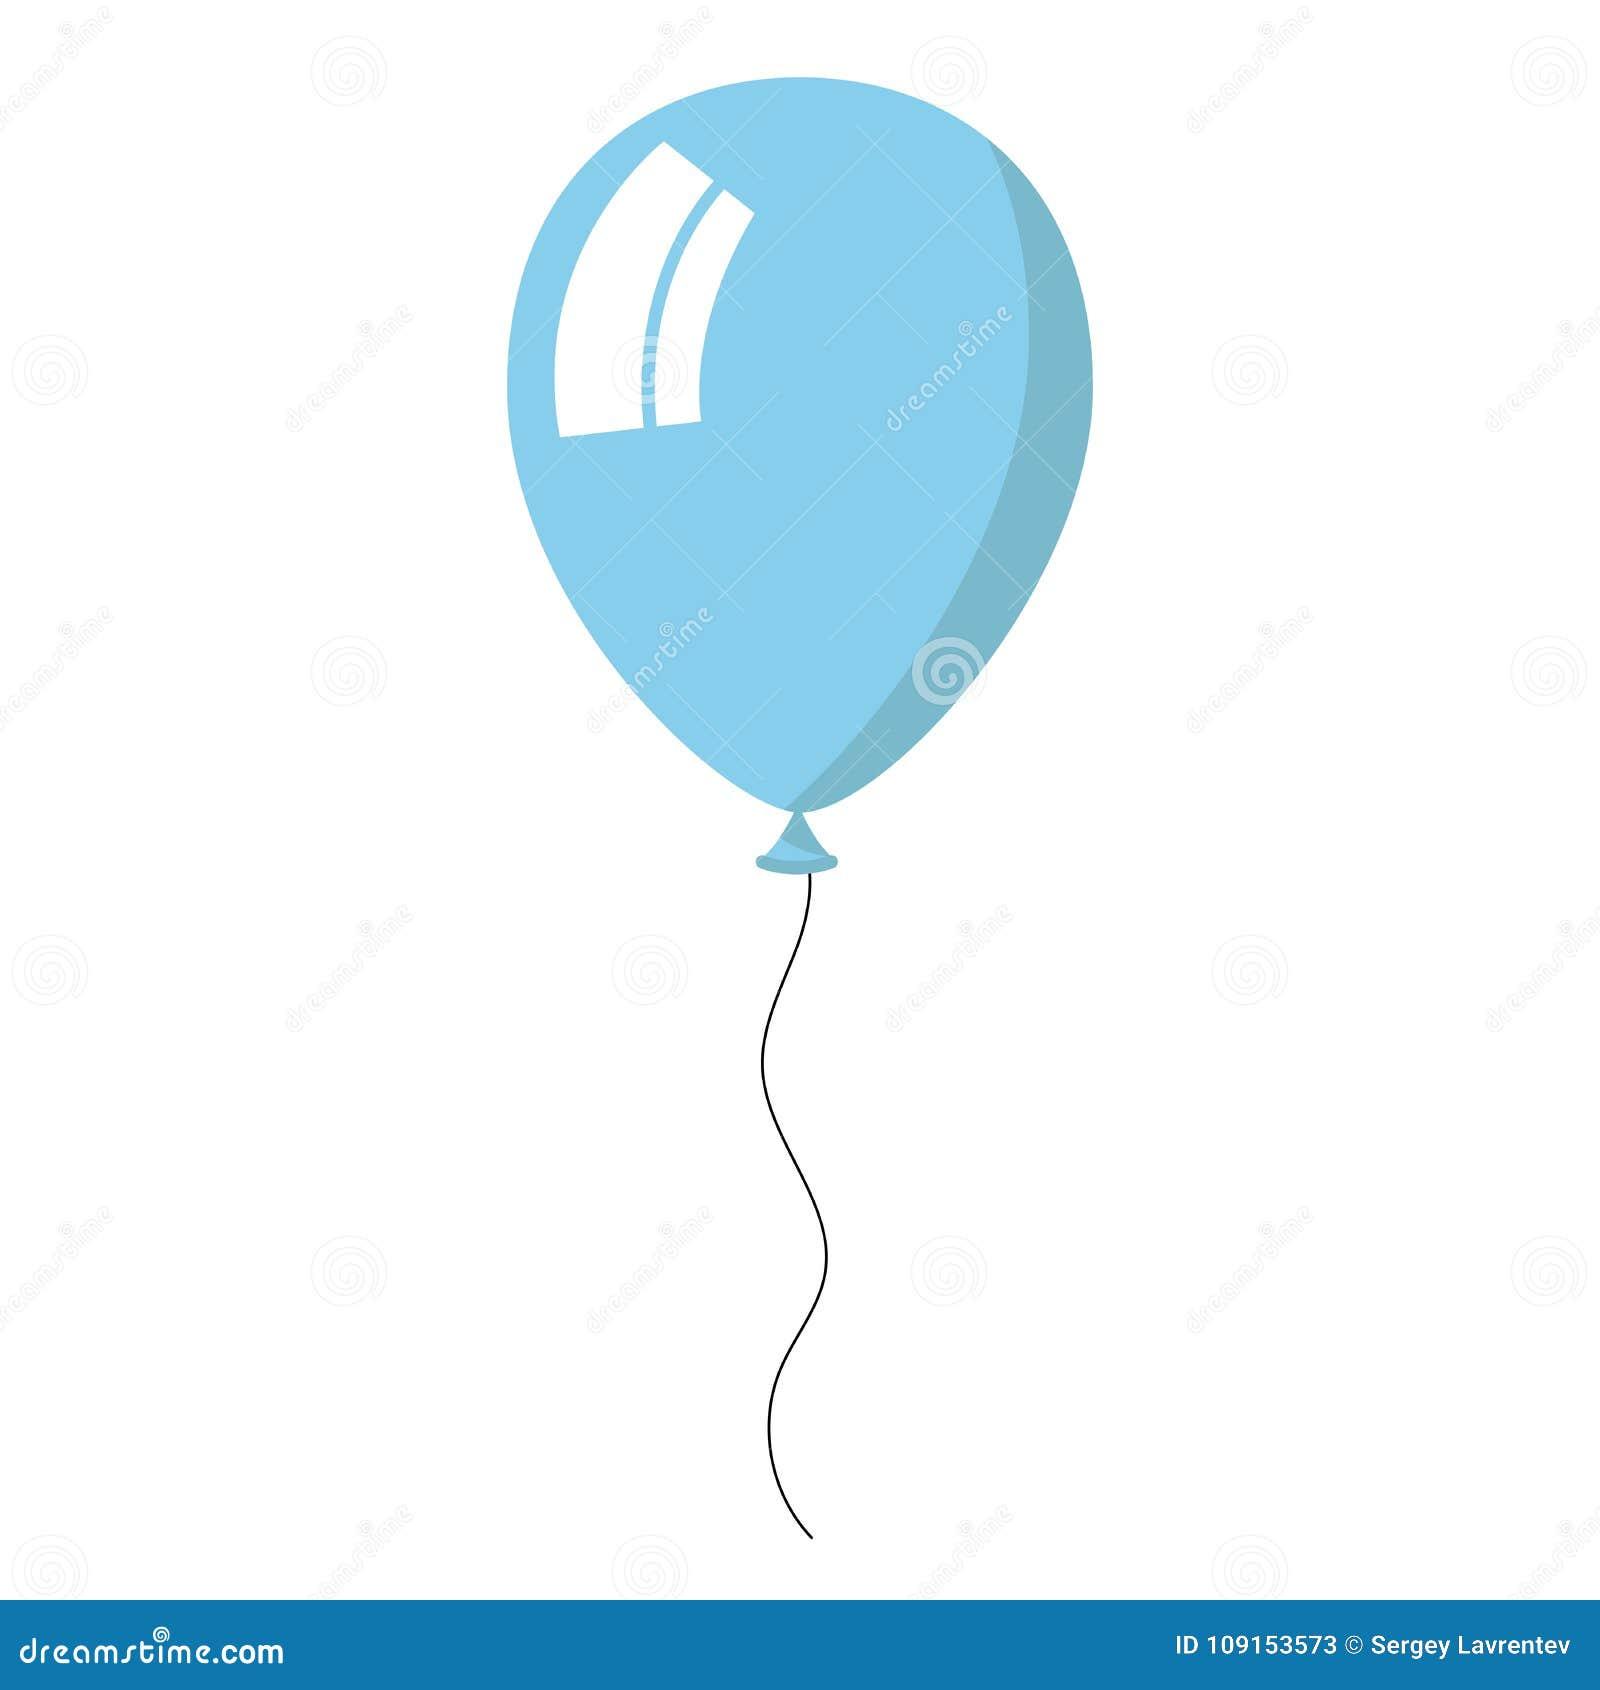 Skyblue balloon on white background